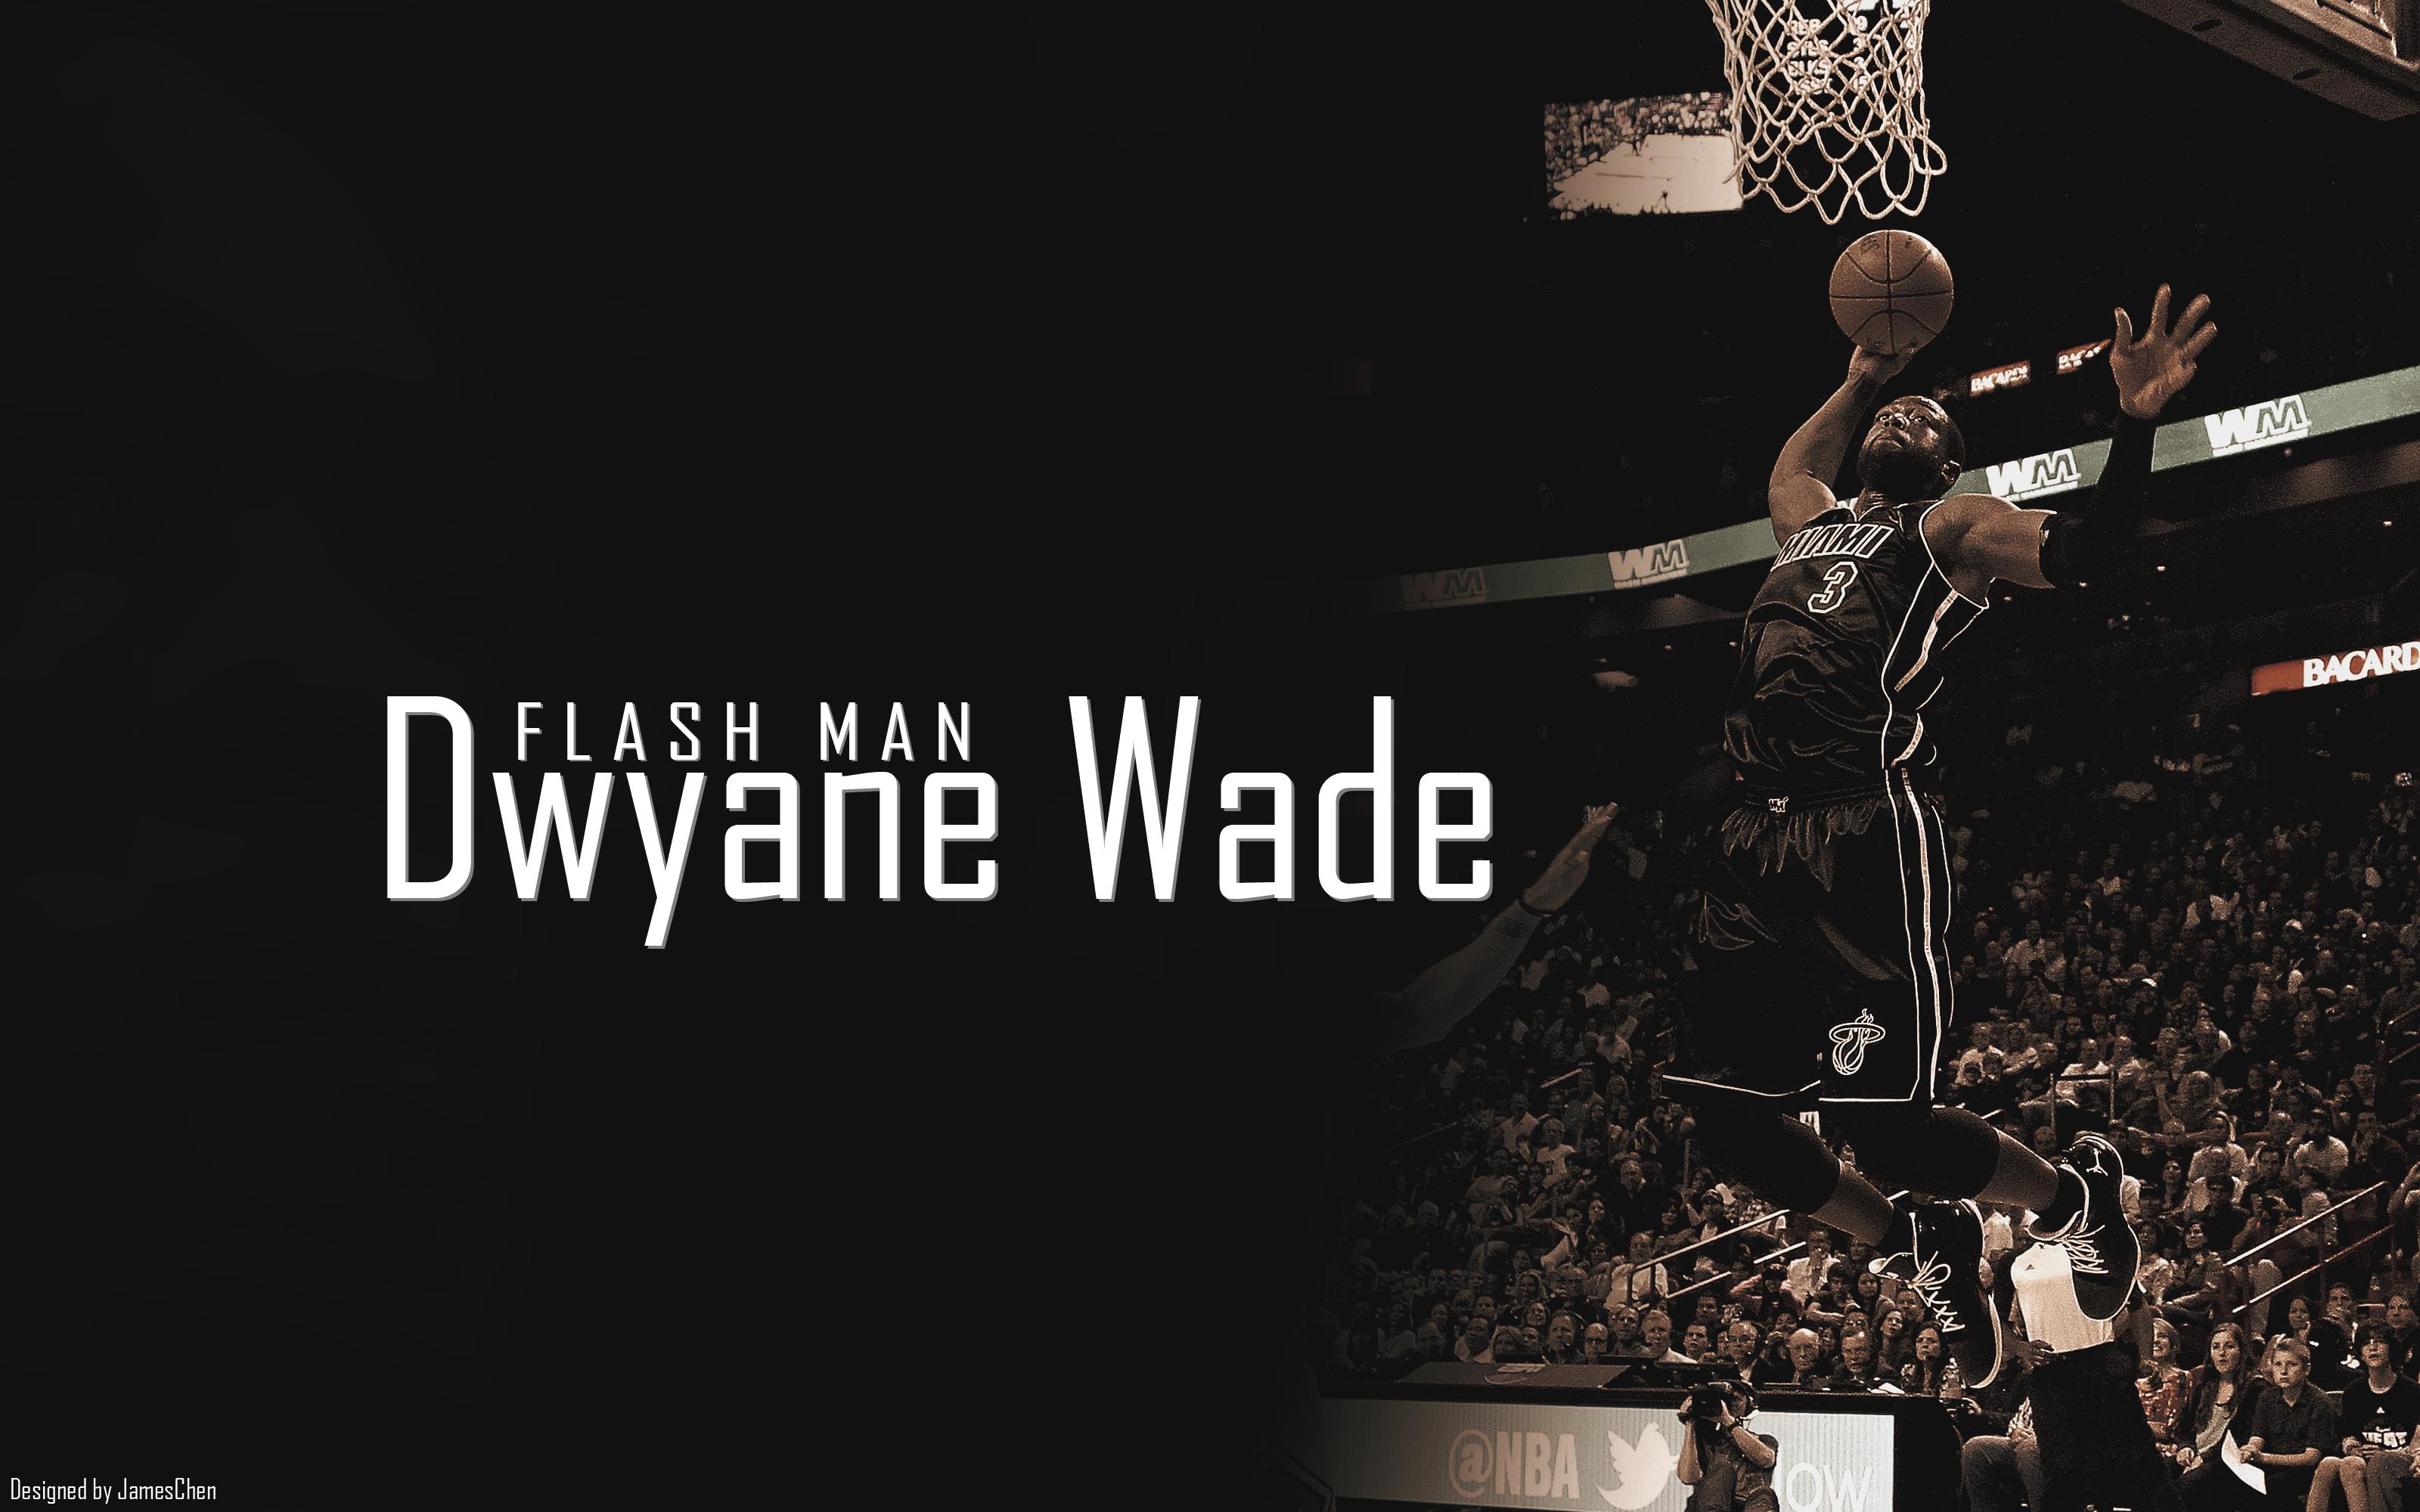 Flash Man Dwyane Wade Exclusive HD Wallpapers 1772 3200x2000